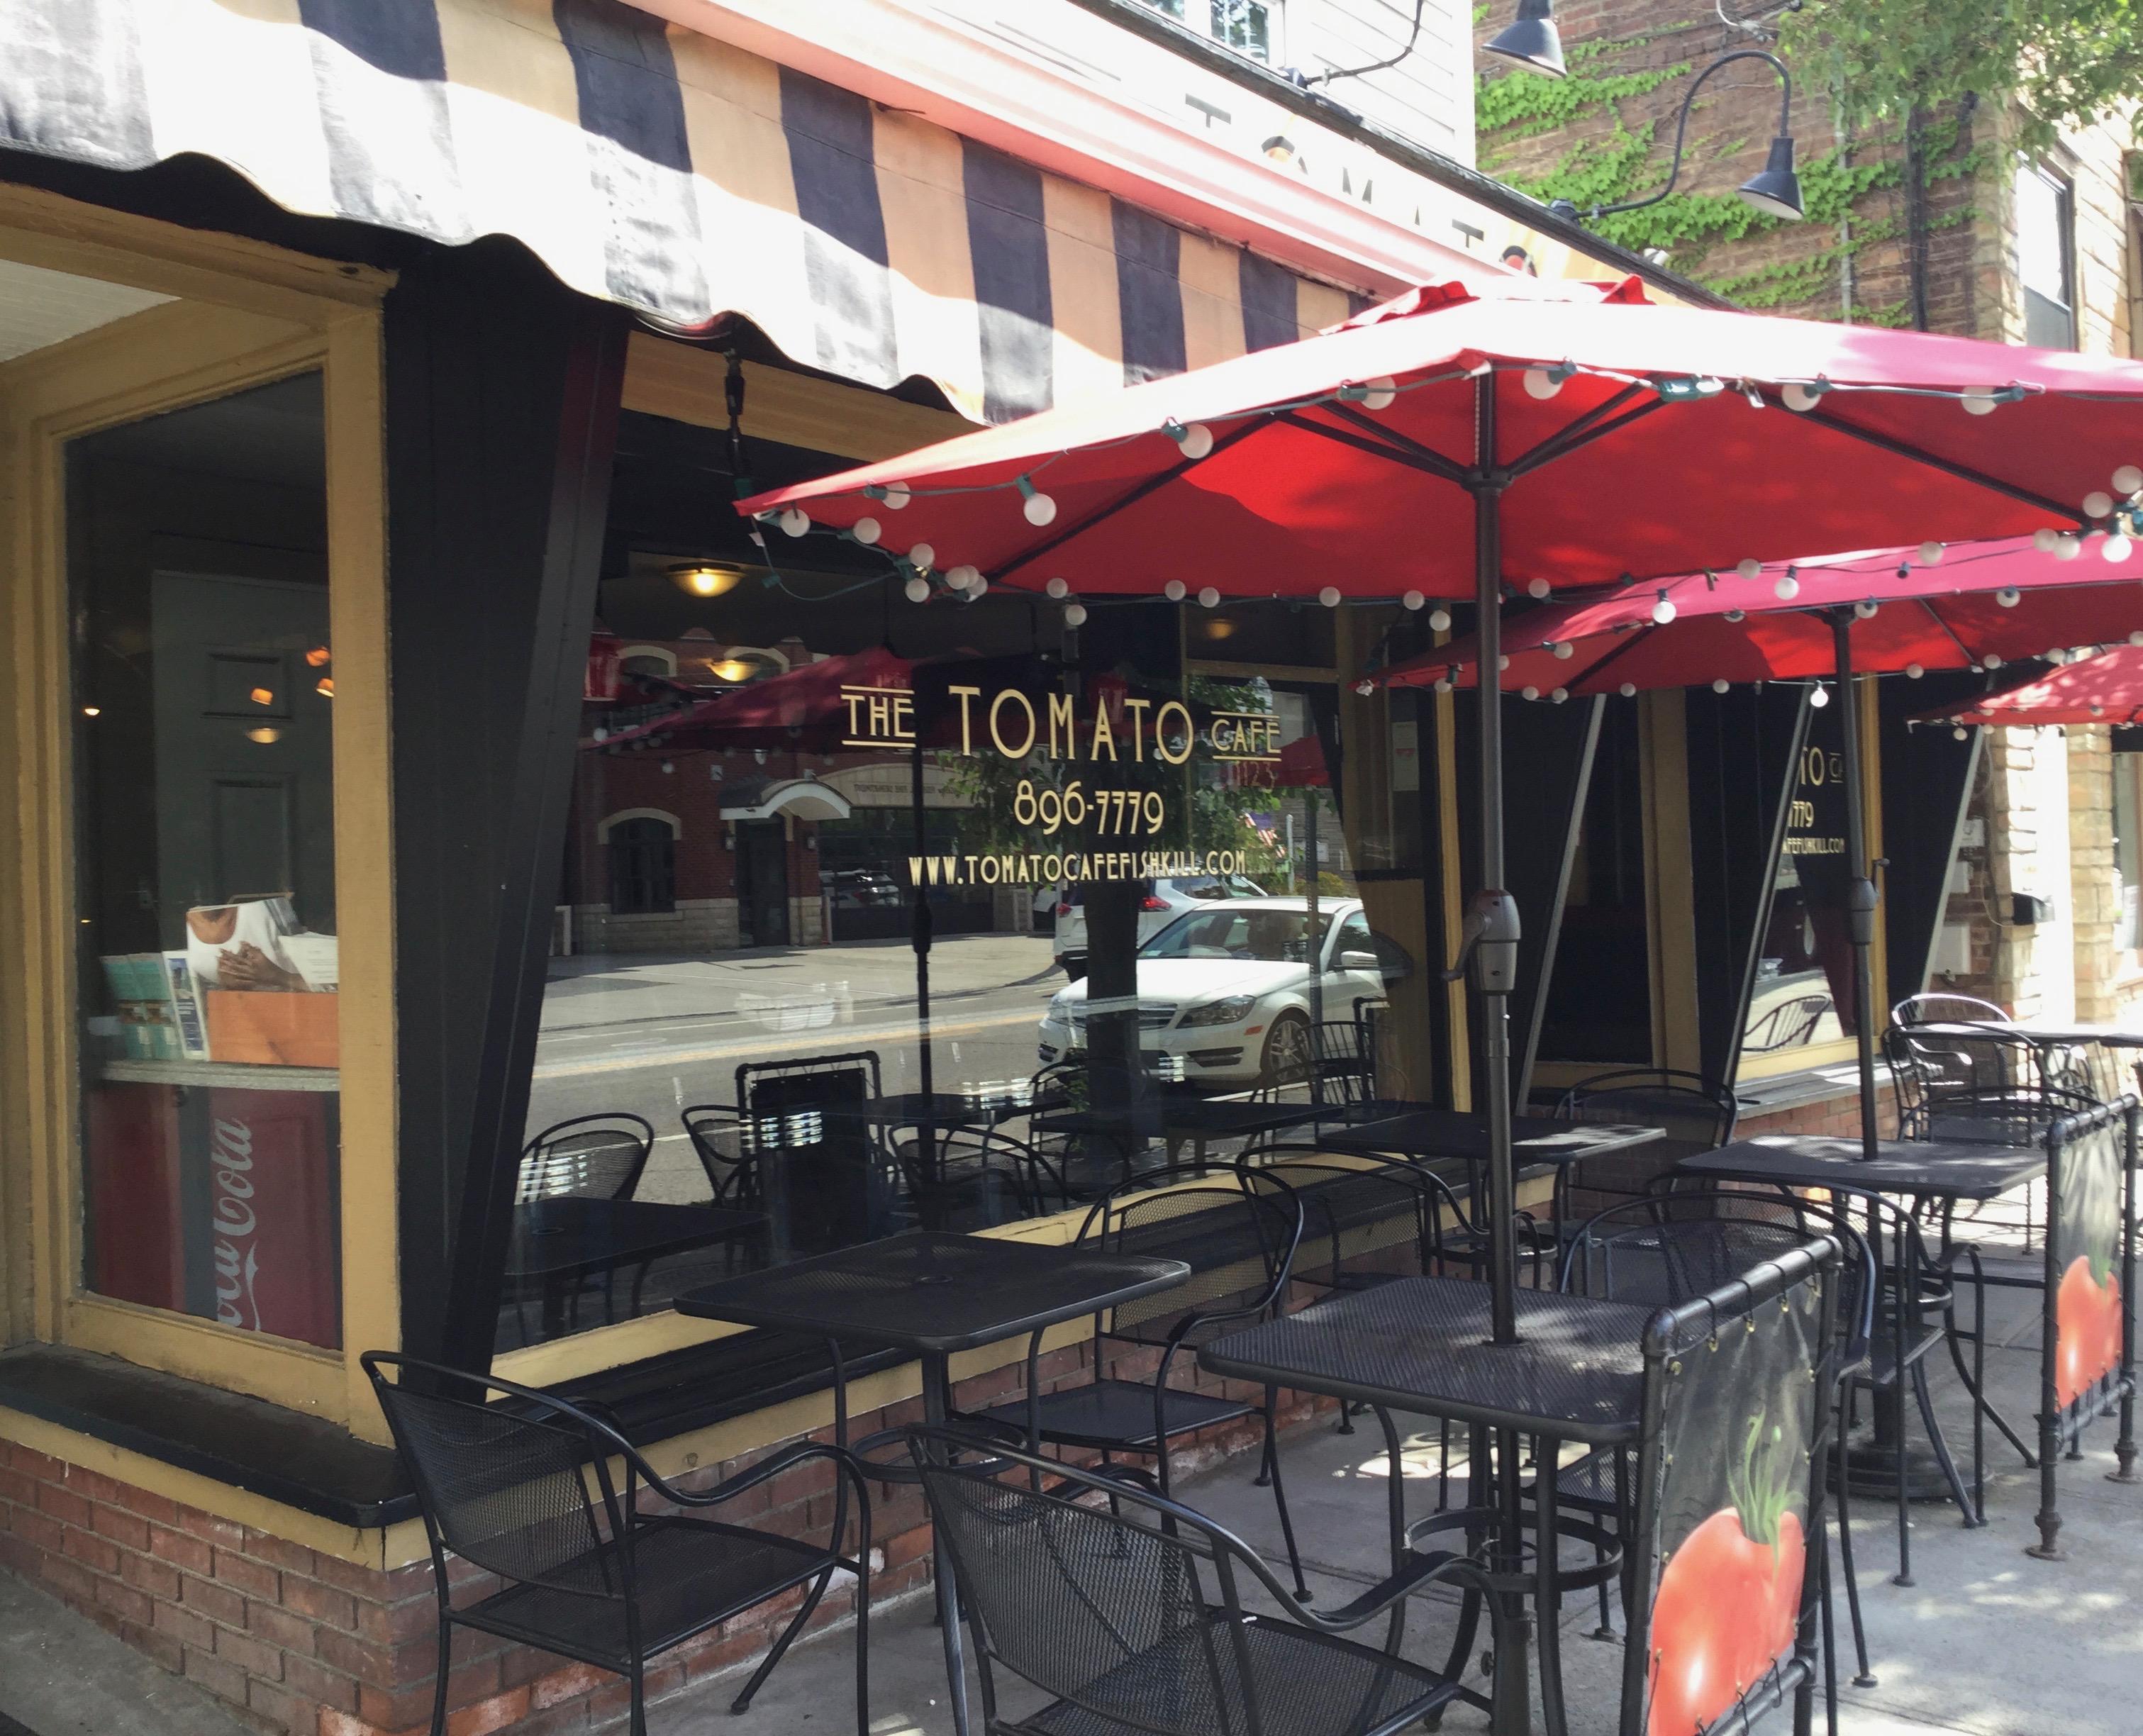 Tomato Cafe